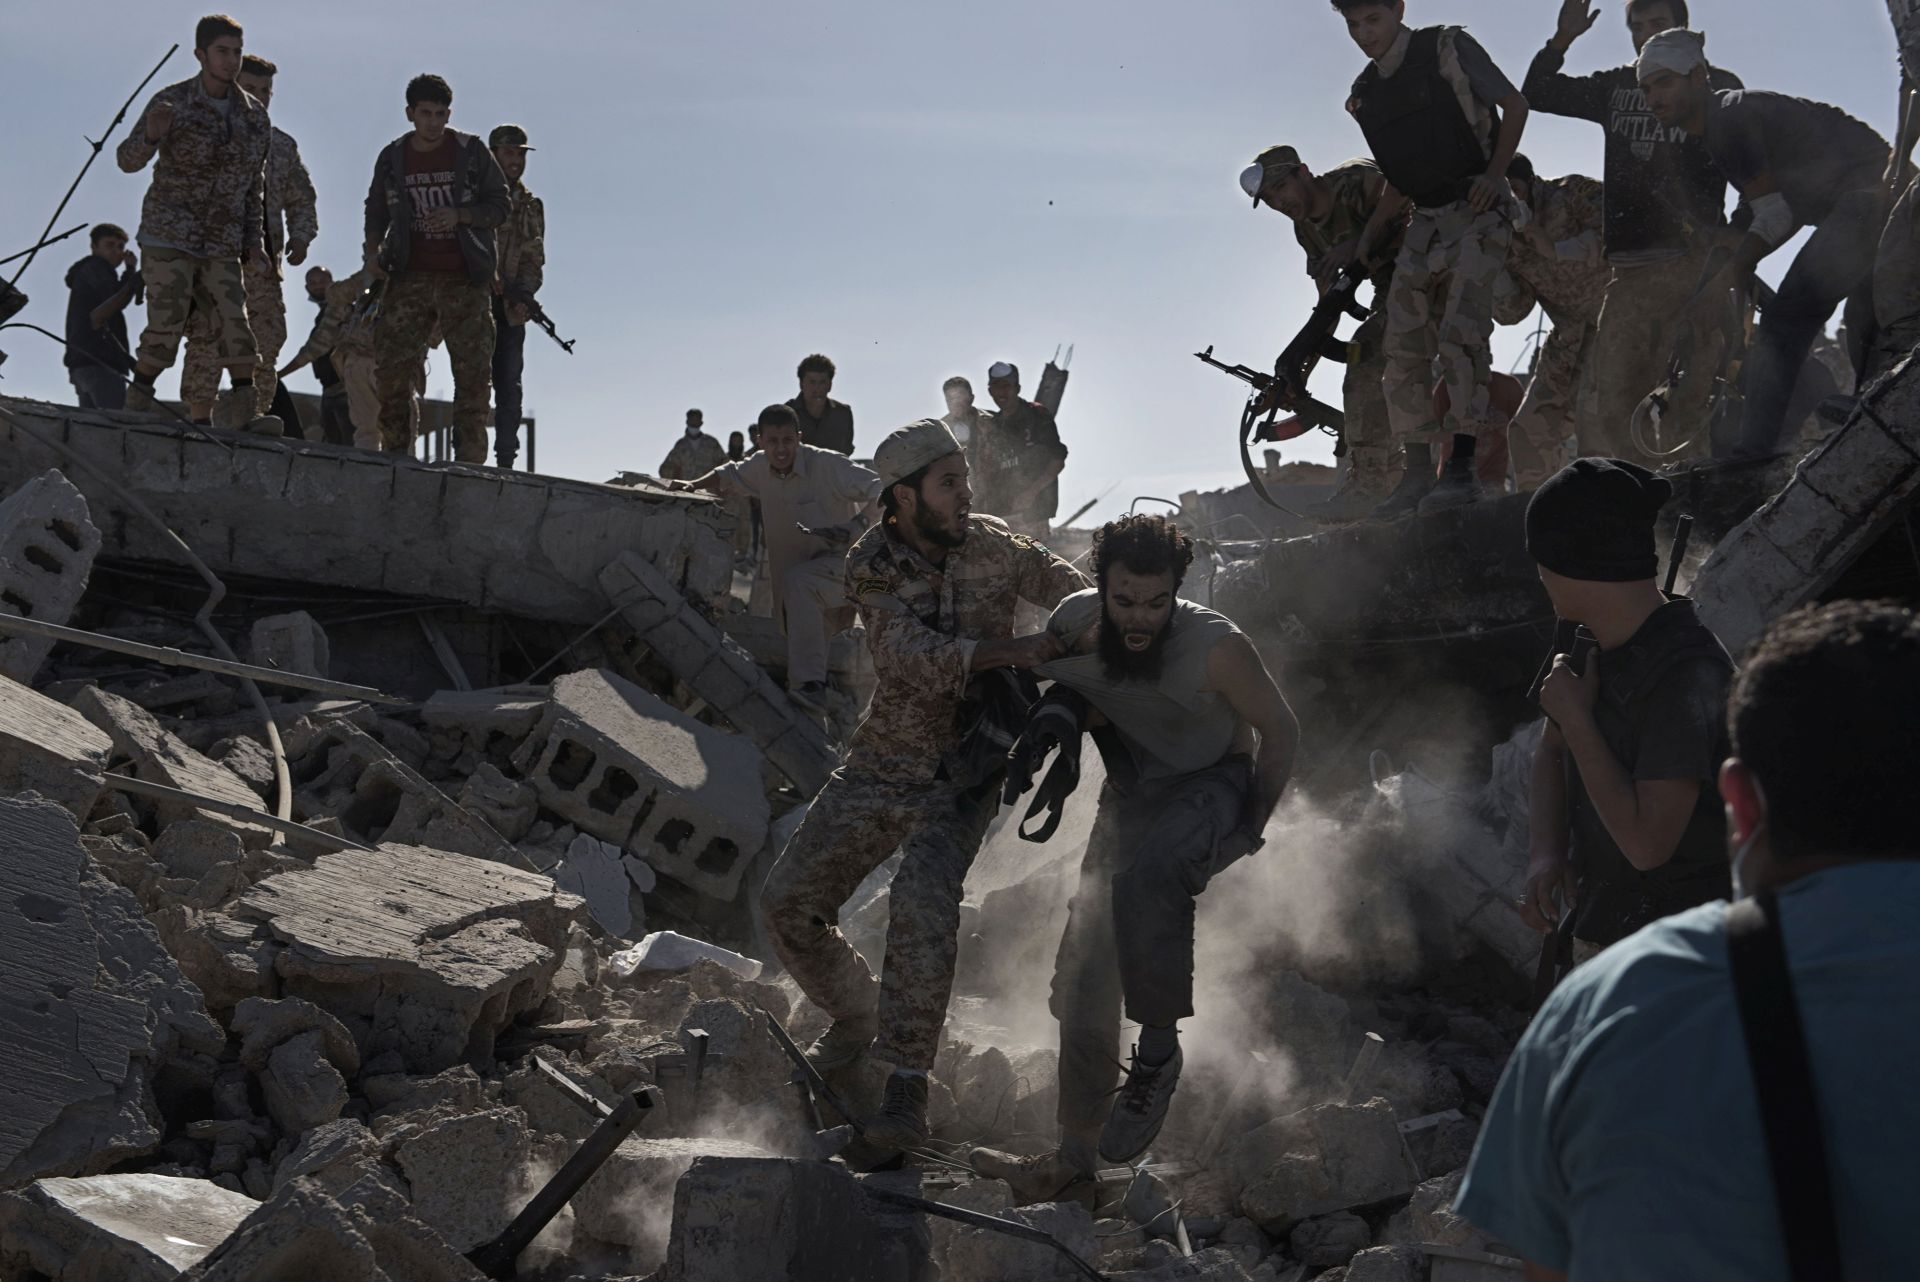 POTPORA TURSKE: Sirijski pobunjenici preuzeli kontrolu nad središtem al-Baba